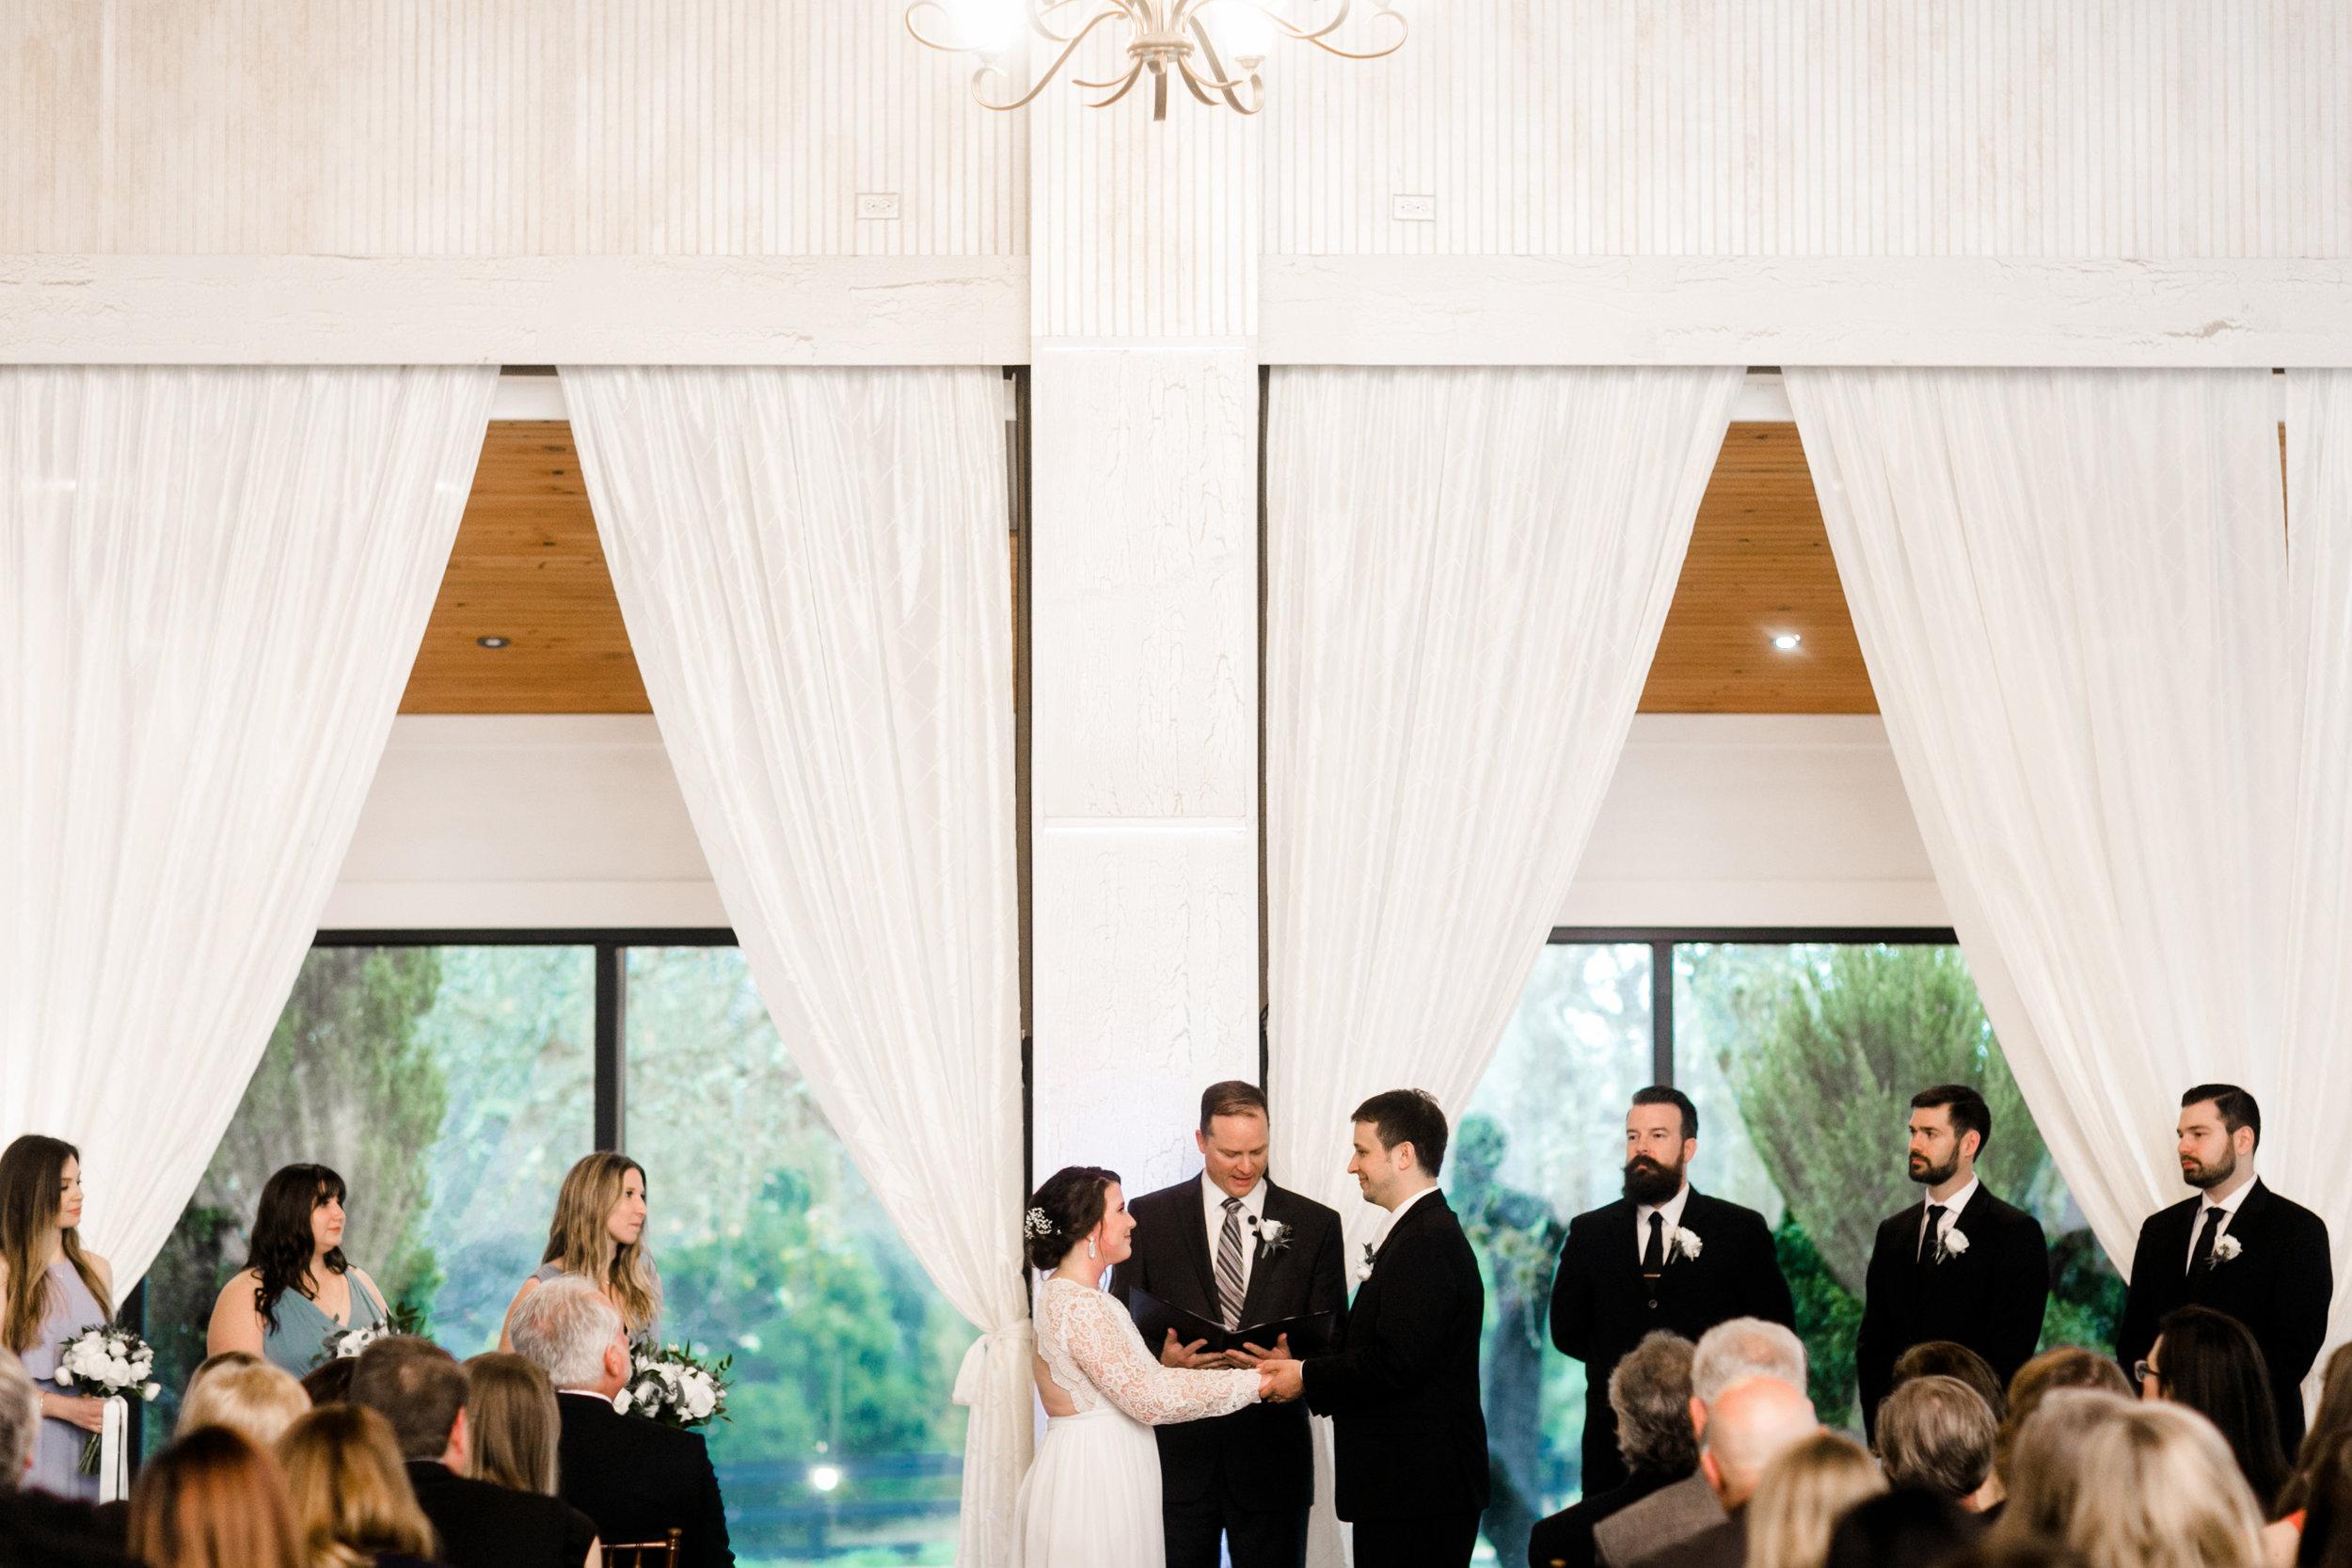 Austin_Texas_Fine_Art_Wedding_Photographer_Kayla_Snell_Photography_Antebellum_Oaks475.jpg